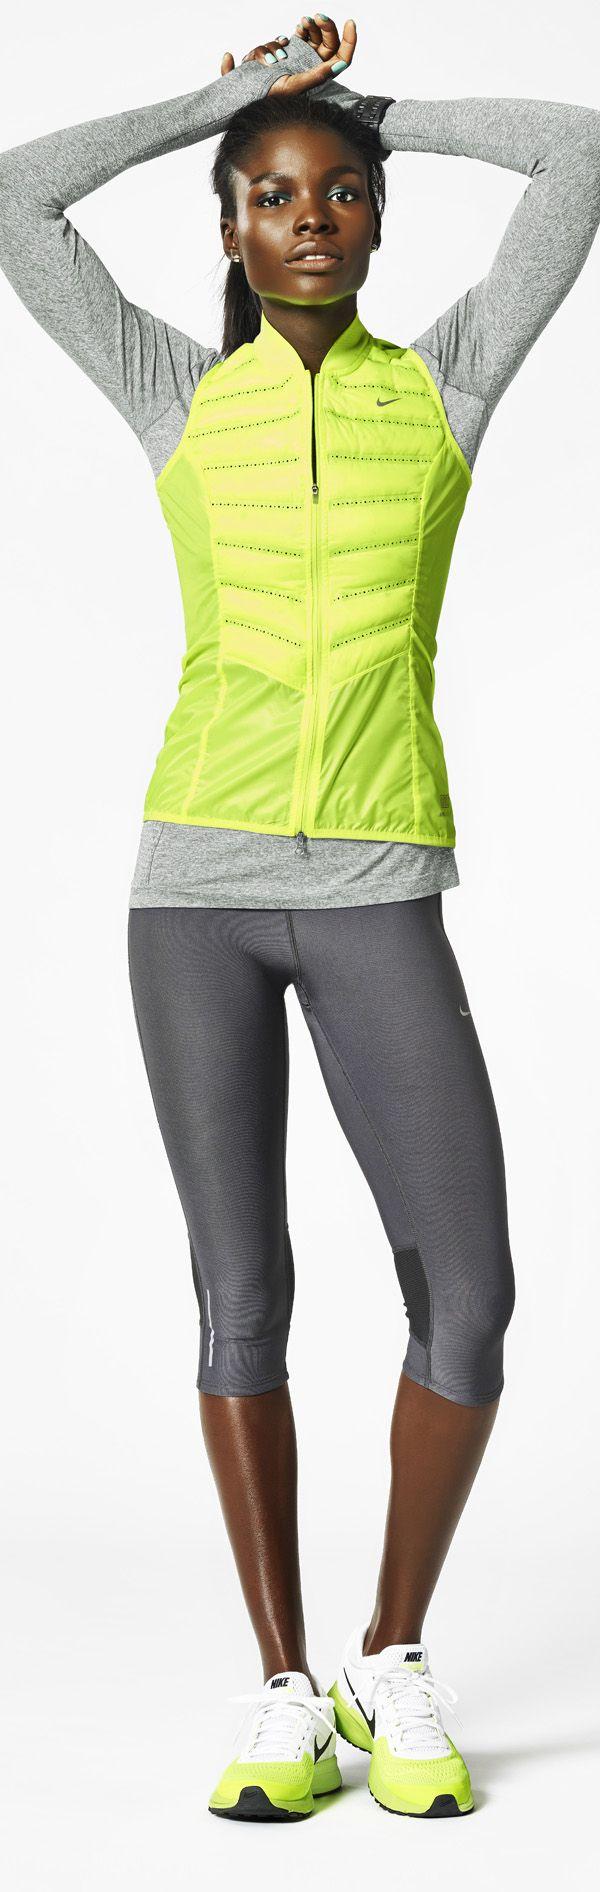 Light up your run. #Nike #running #style